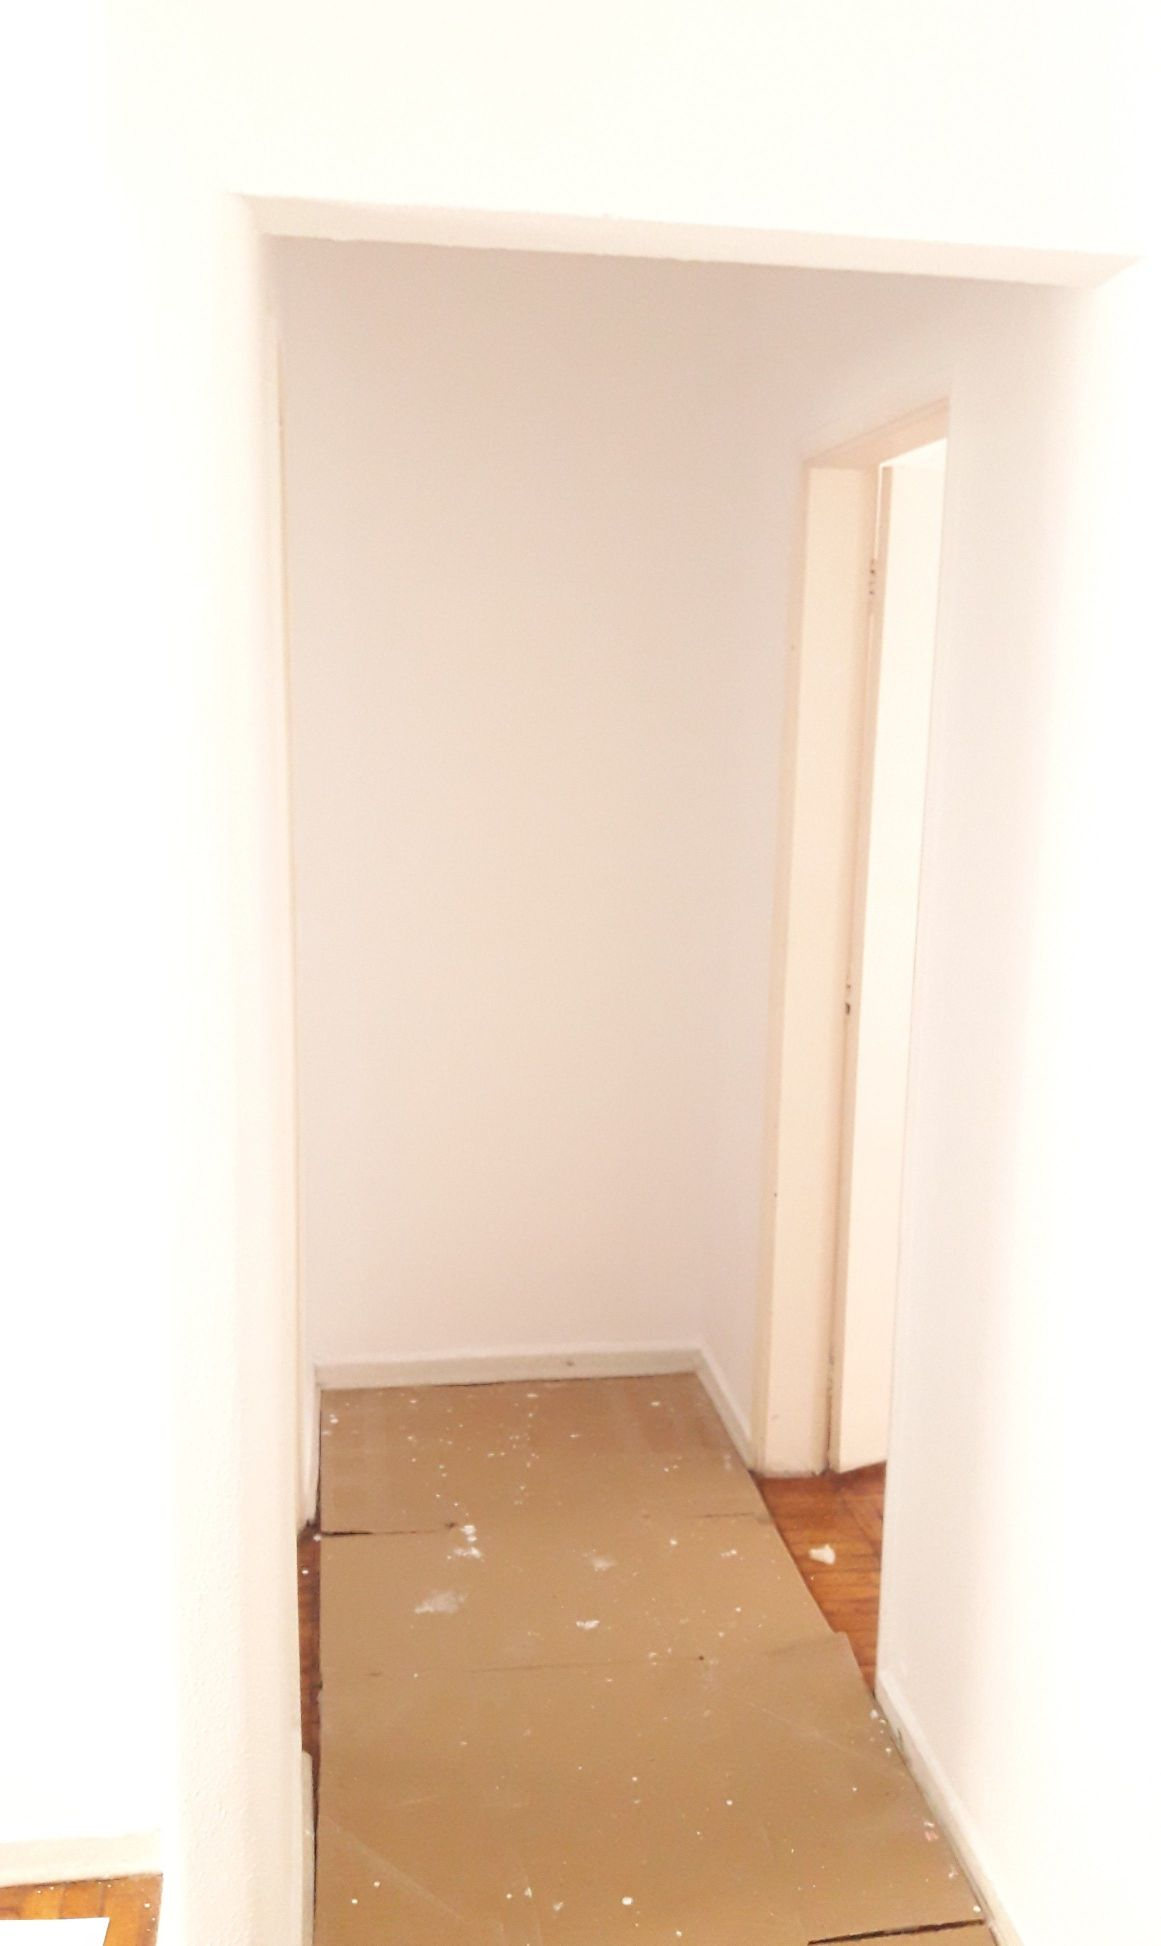 Pintura de corredor (Depois)